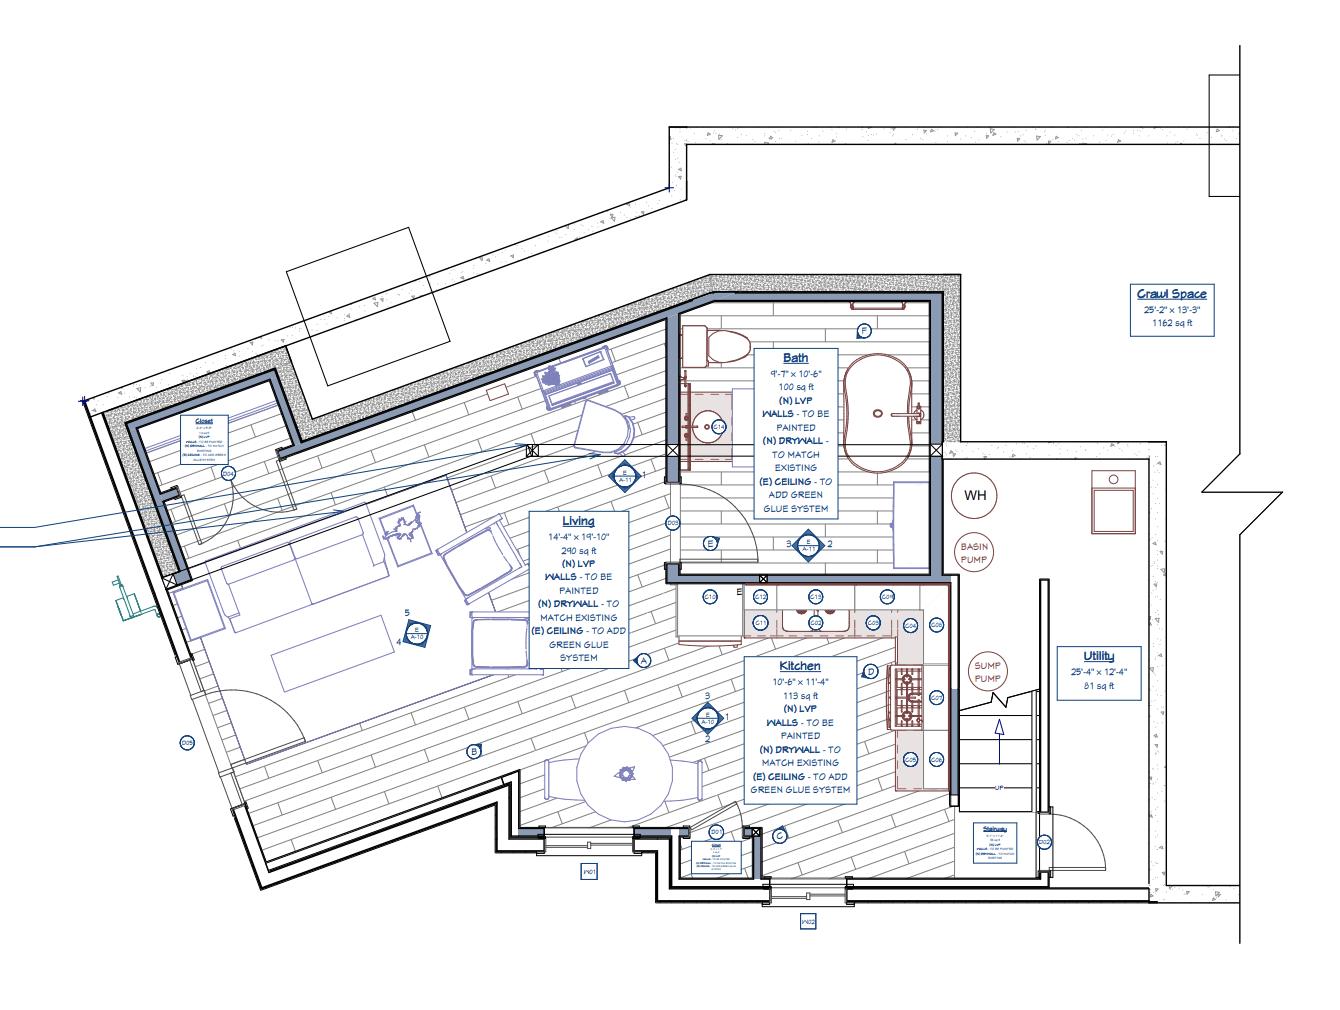 wark basement floorplan